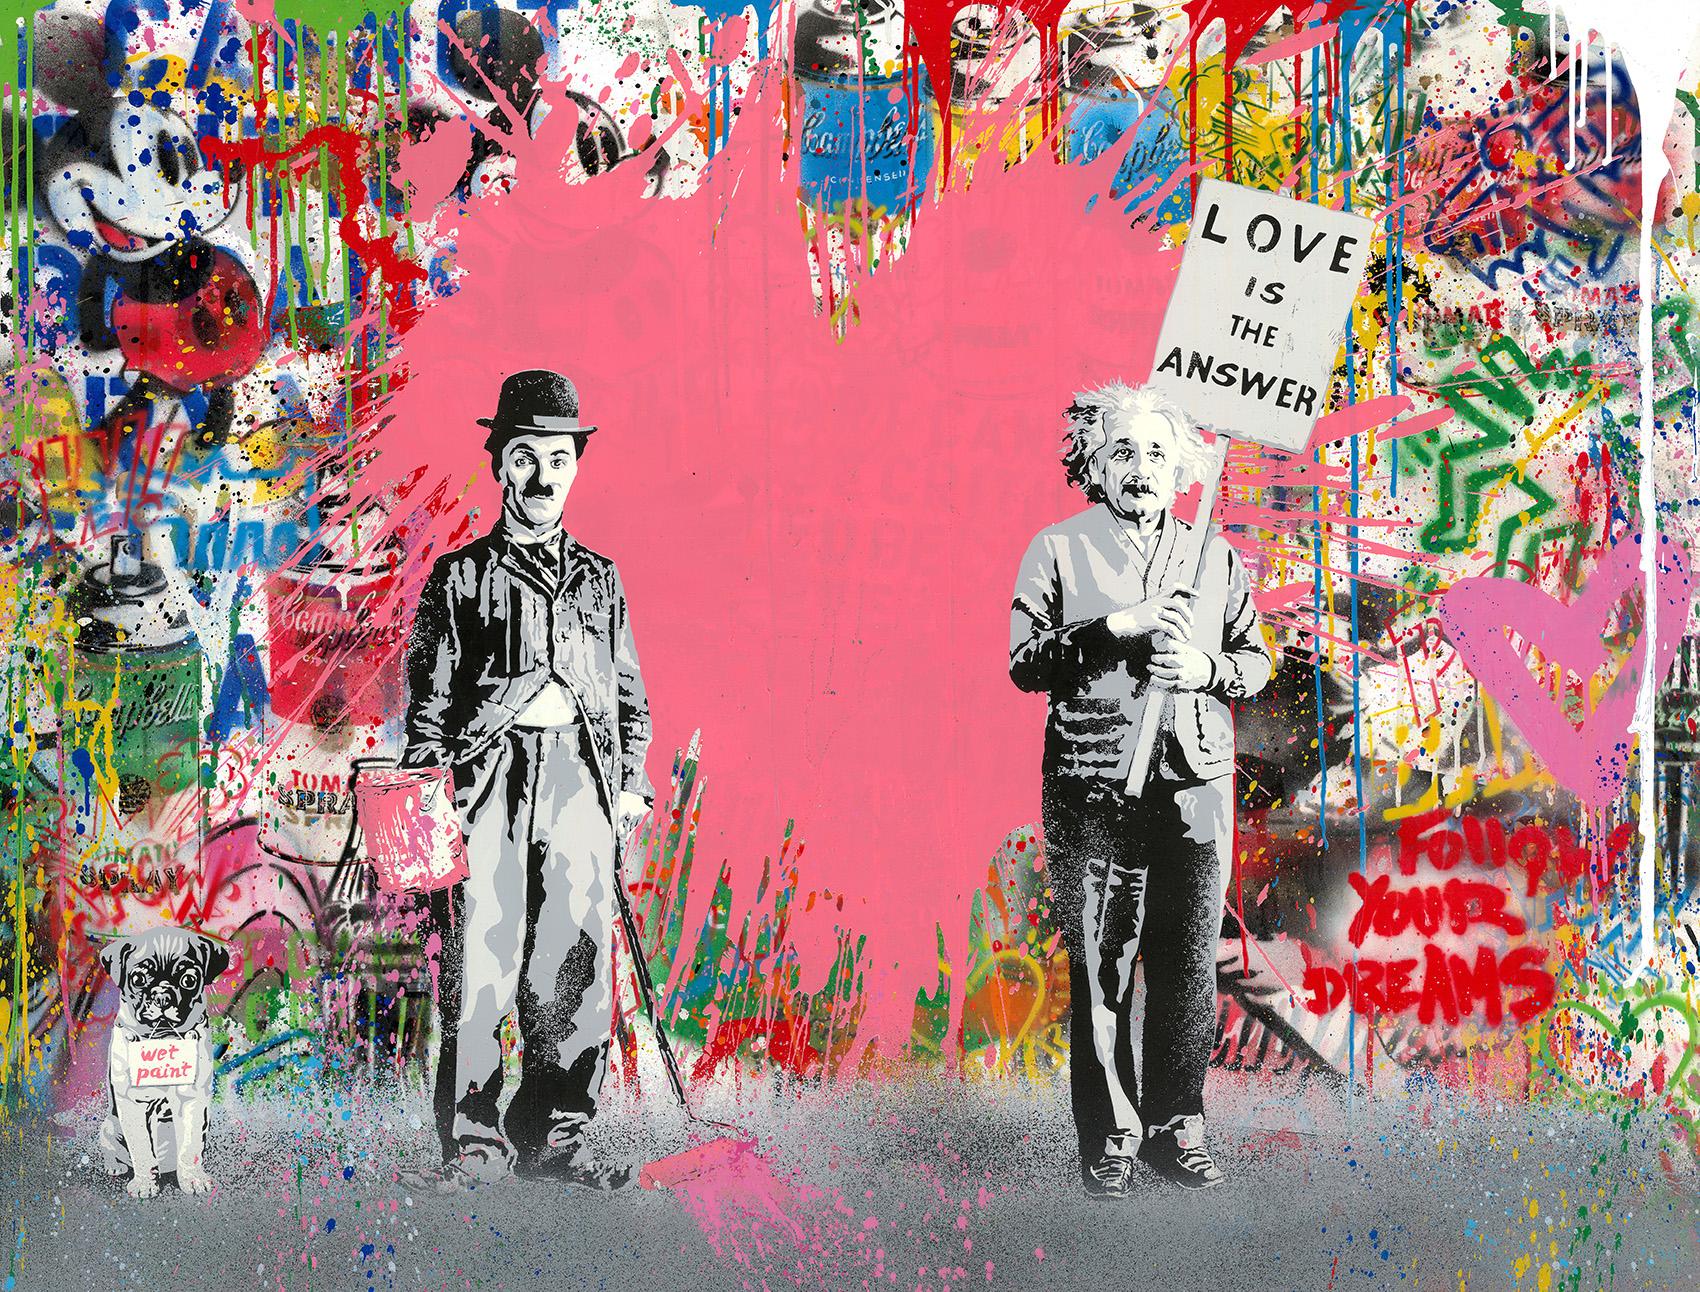 Mr. Brainwash - Juxtapose , 9003-012-103